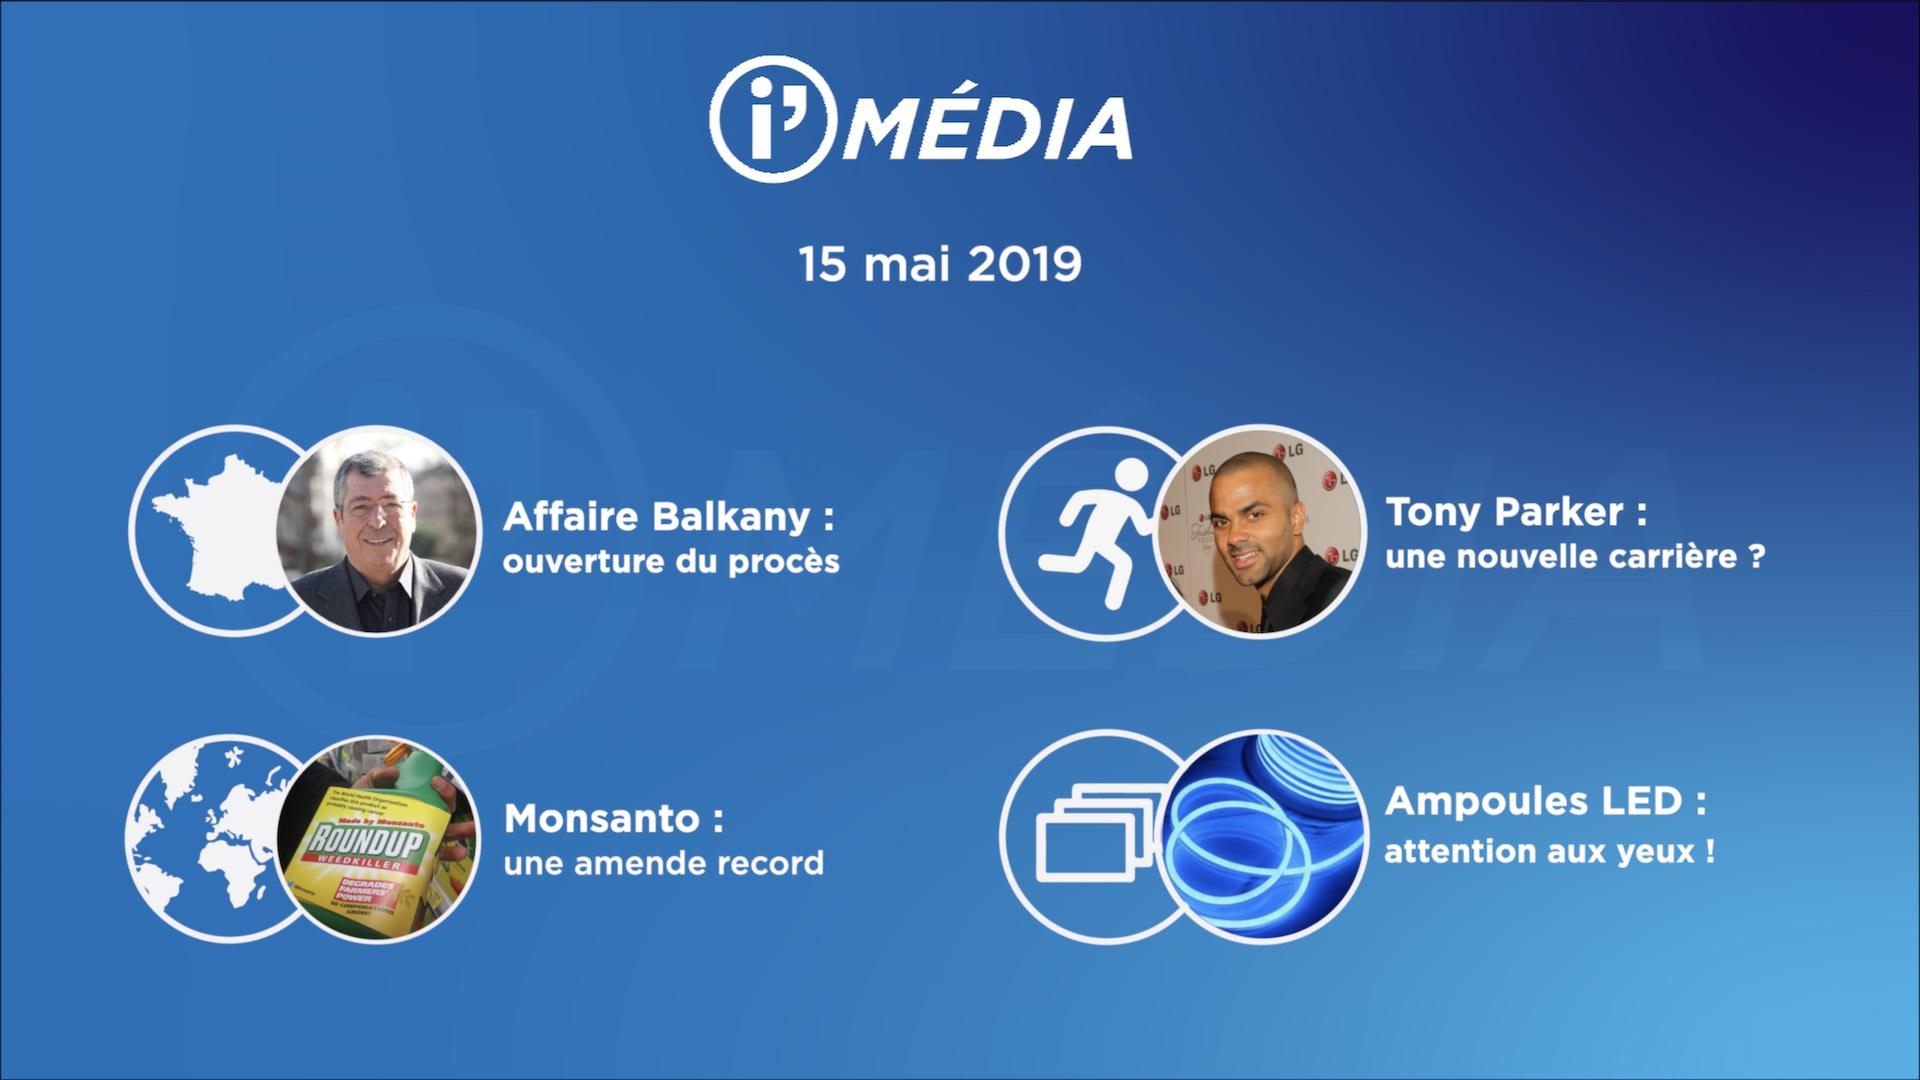 I'média 15 mai 2019